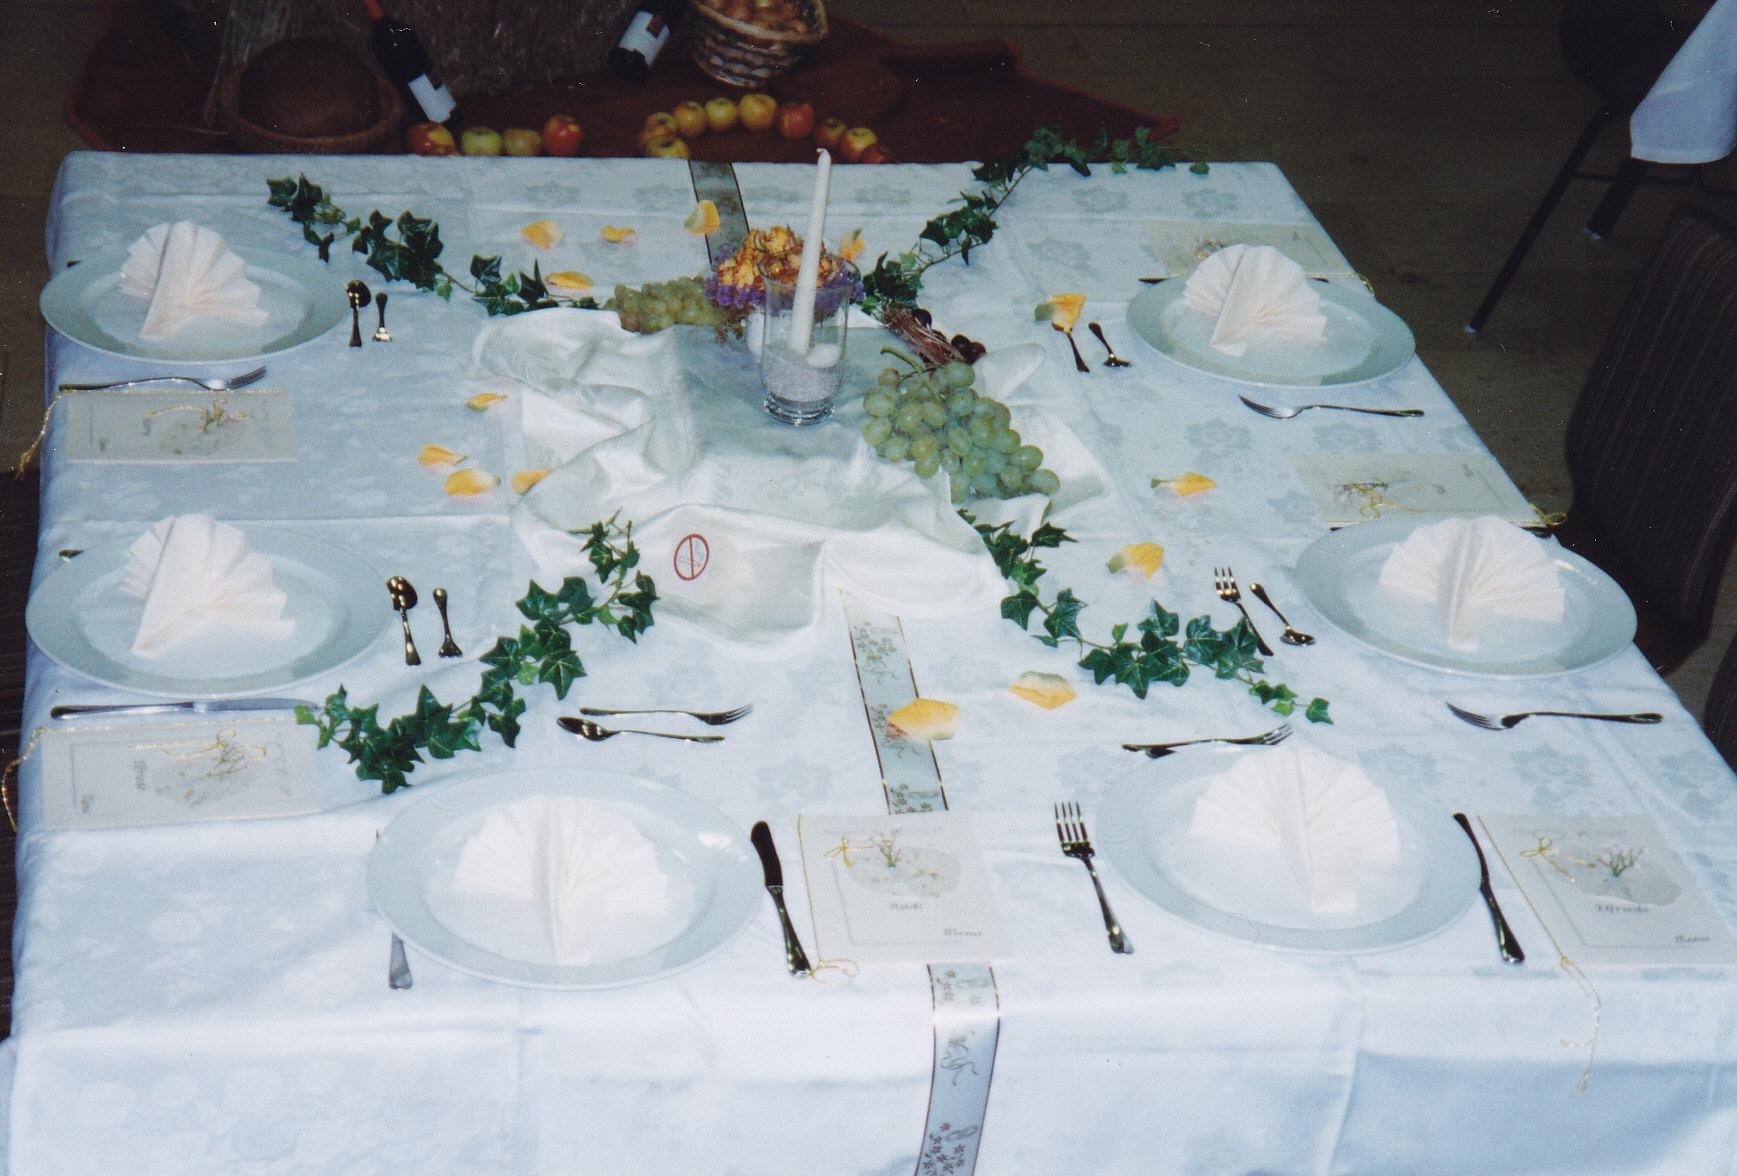 Deko Menukarten Tischdekoration Kerzen Festtisch